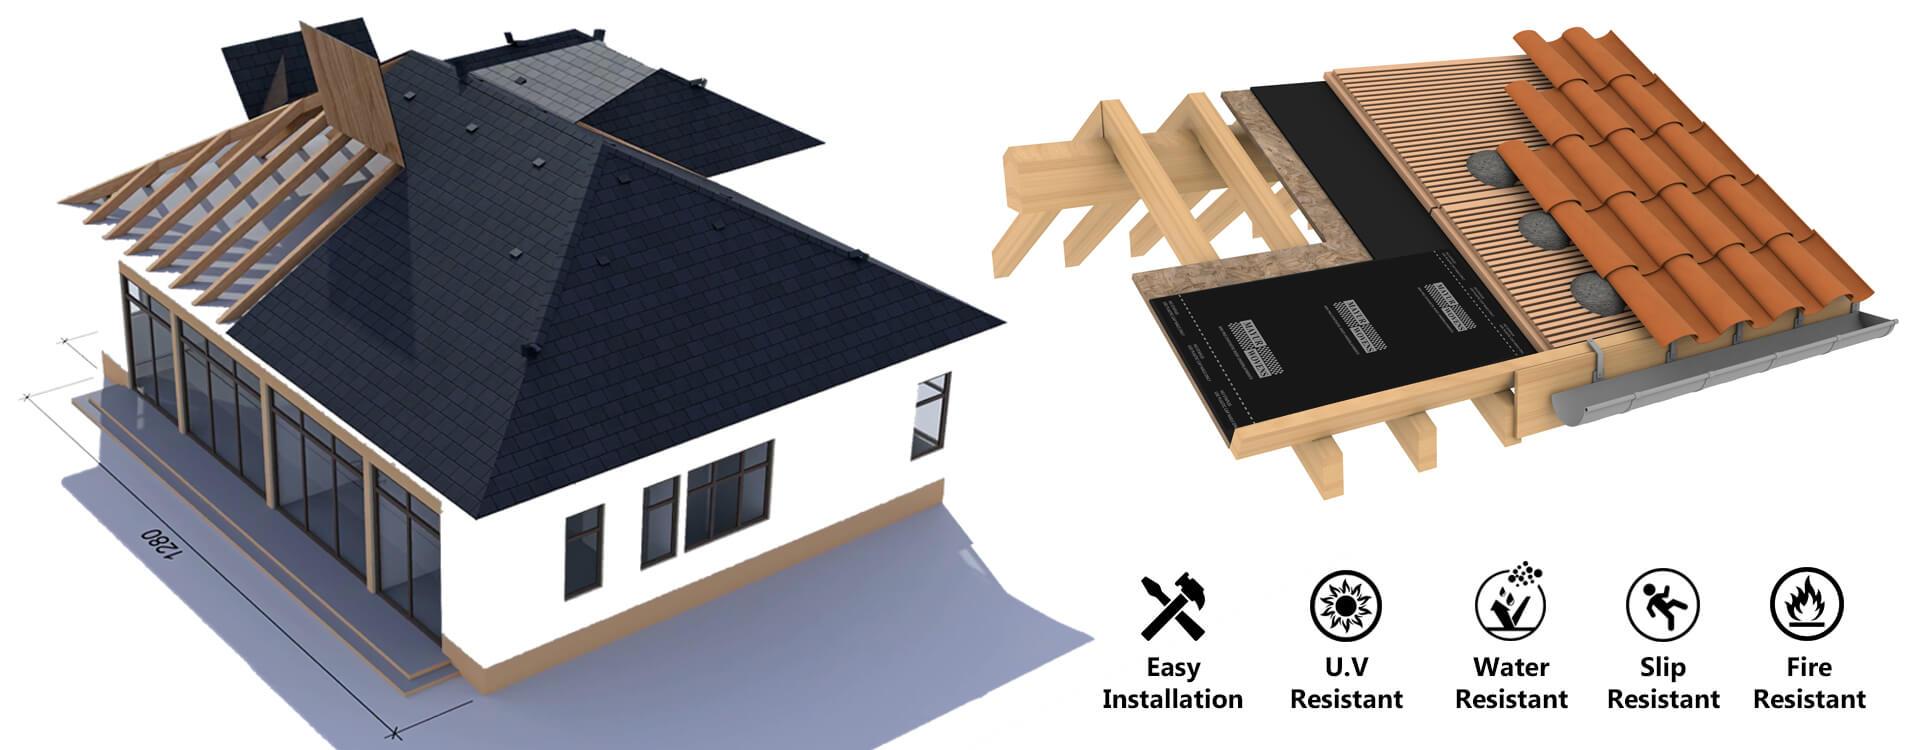 U.V Resistant Synthetic Roof Underlayment